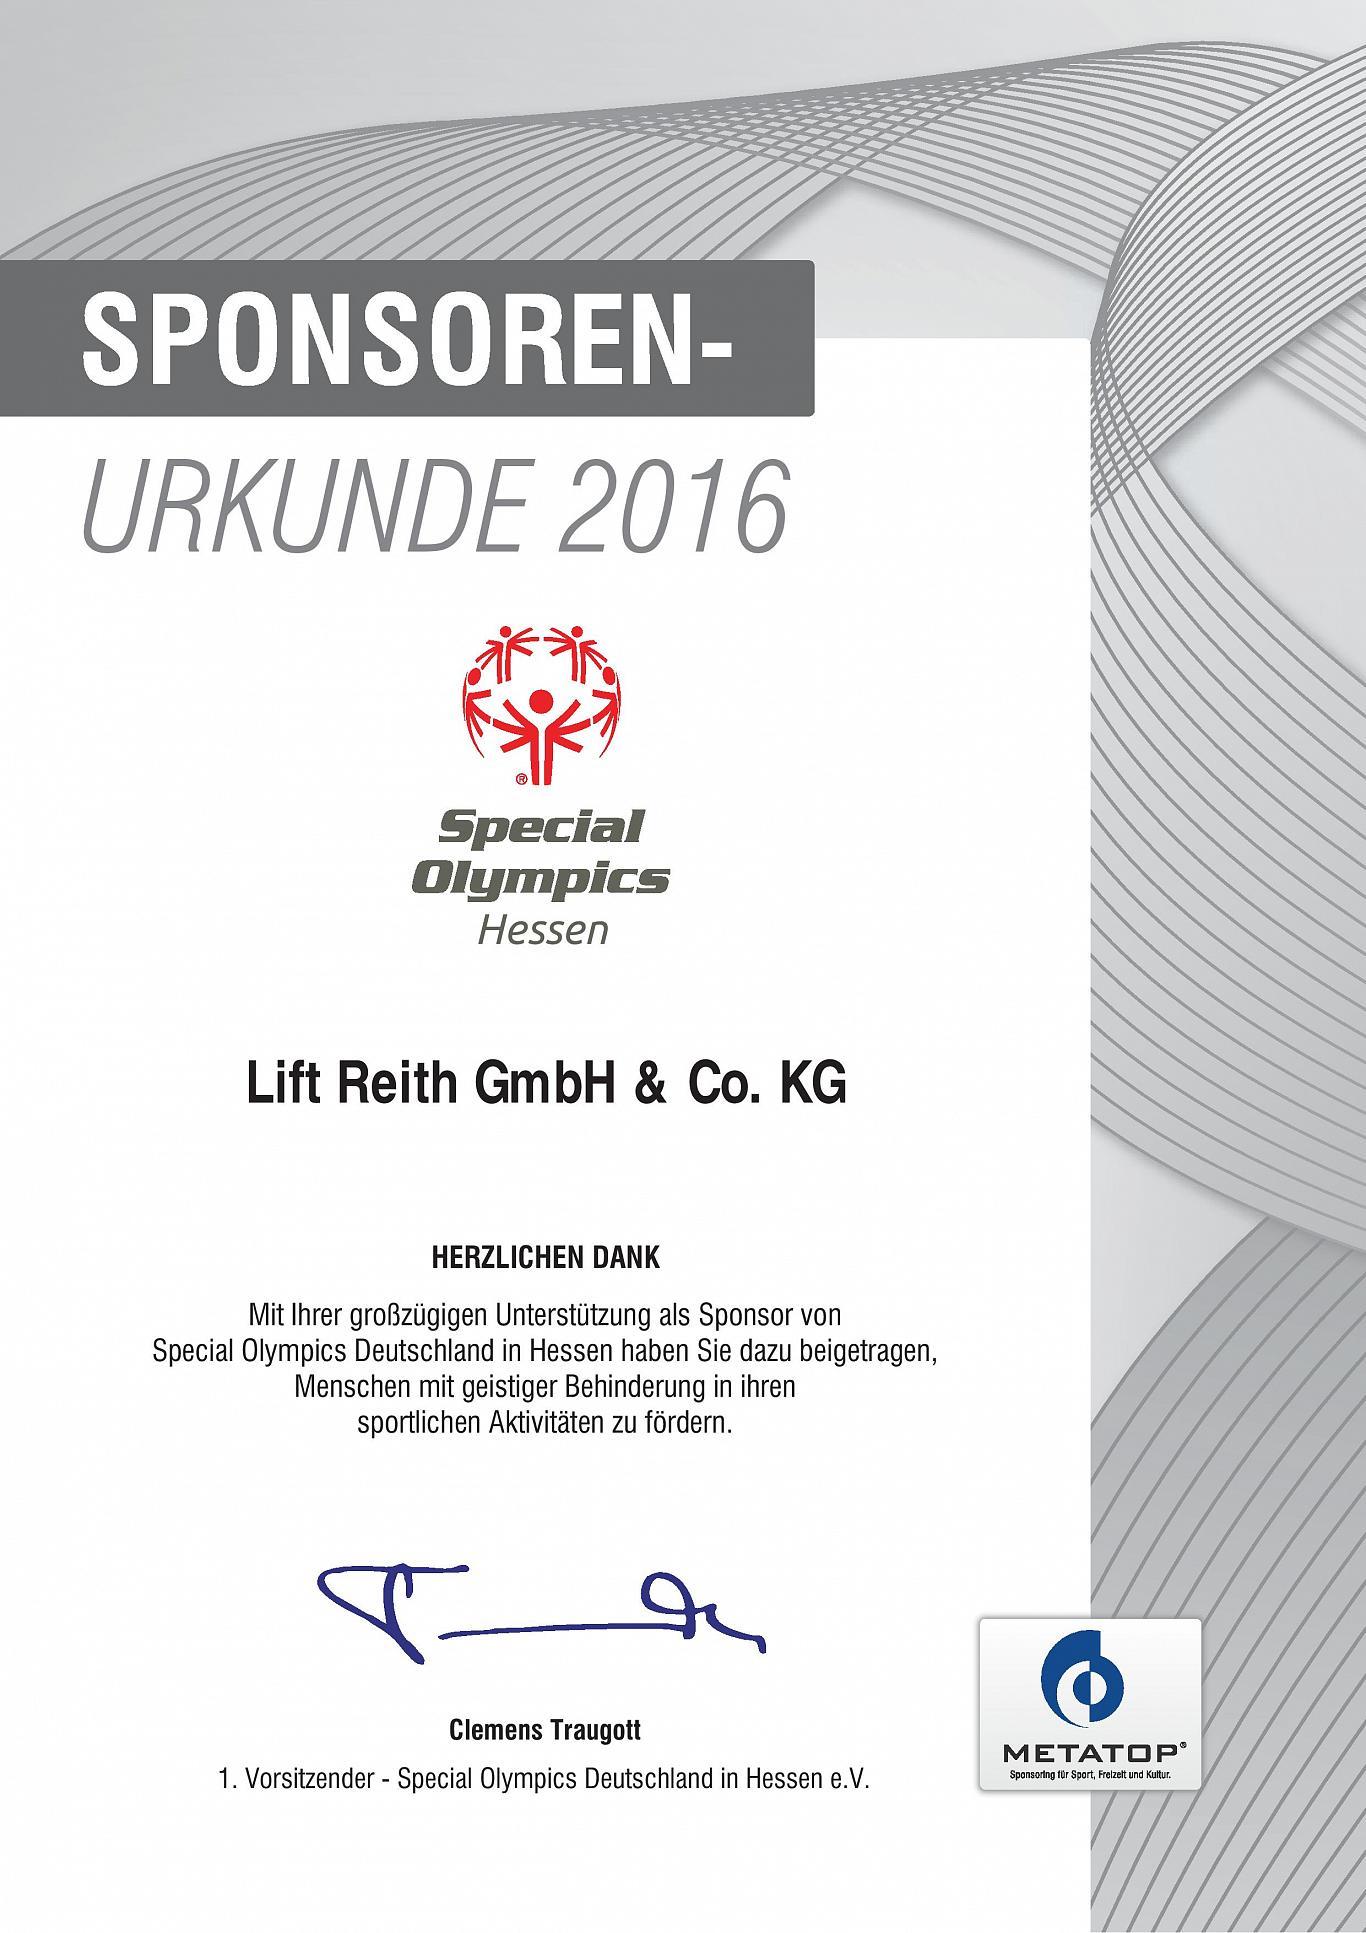 Sponsoren Urkunde Special Olympics Hessen 2016